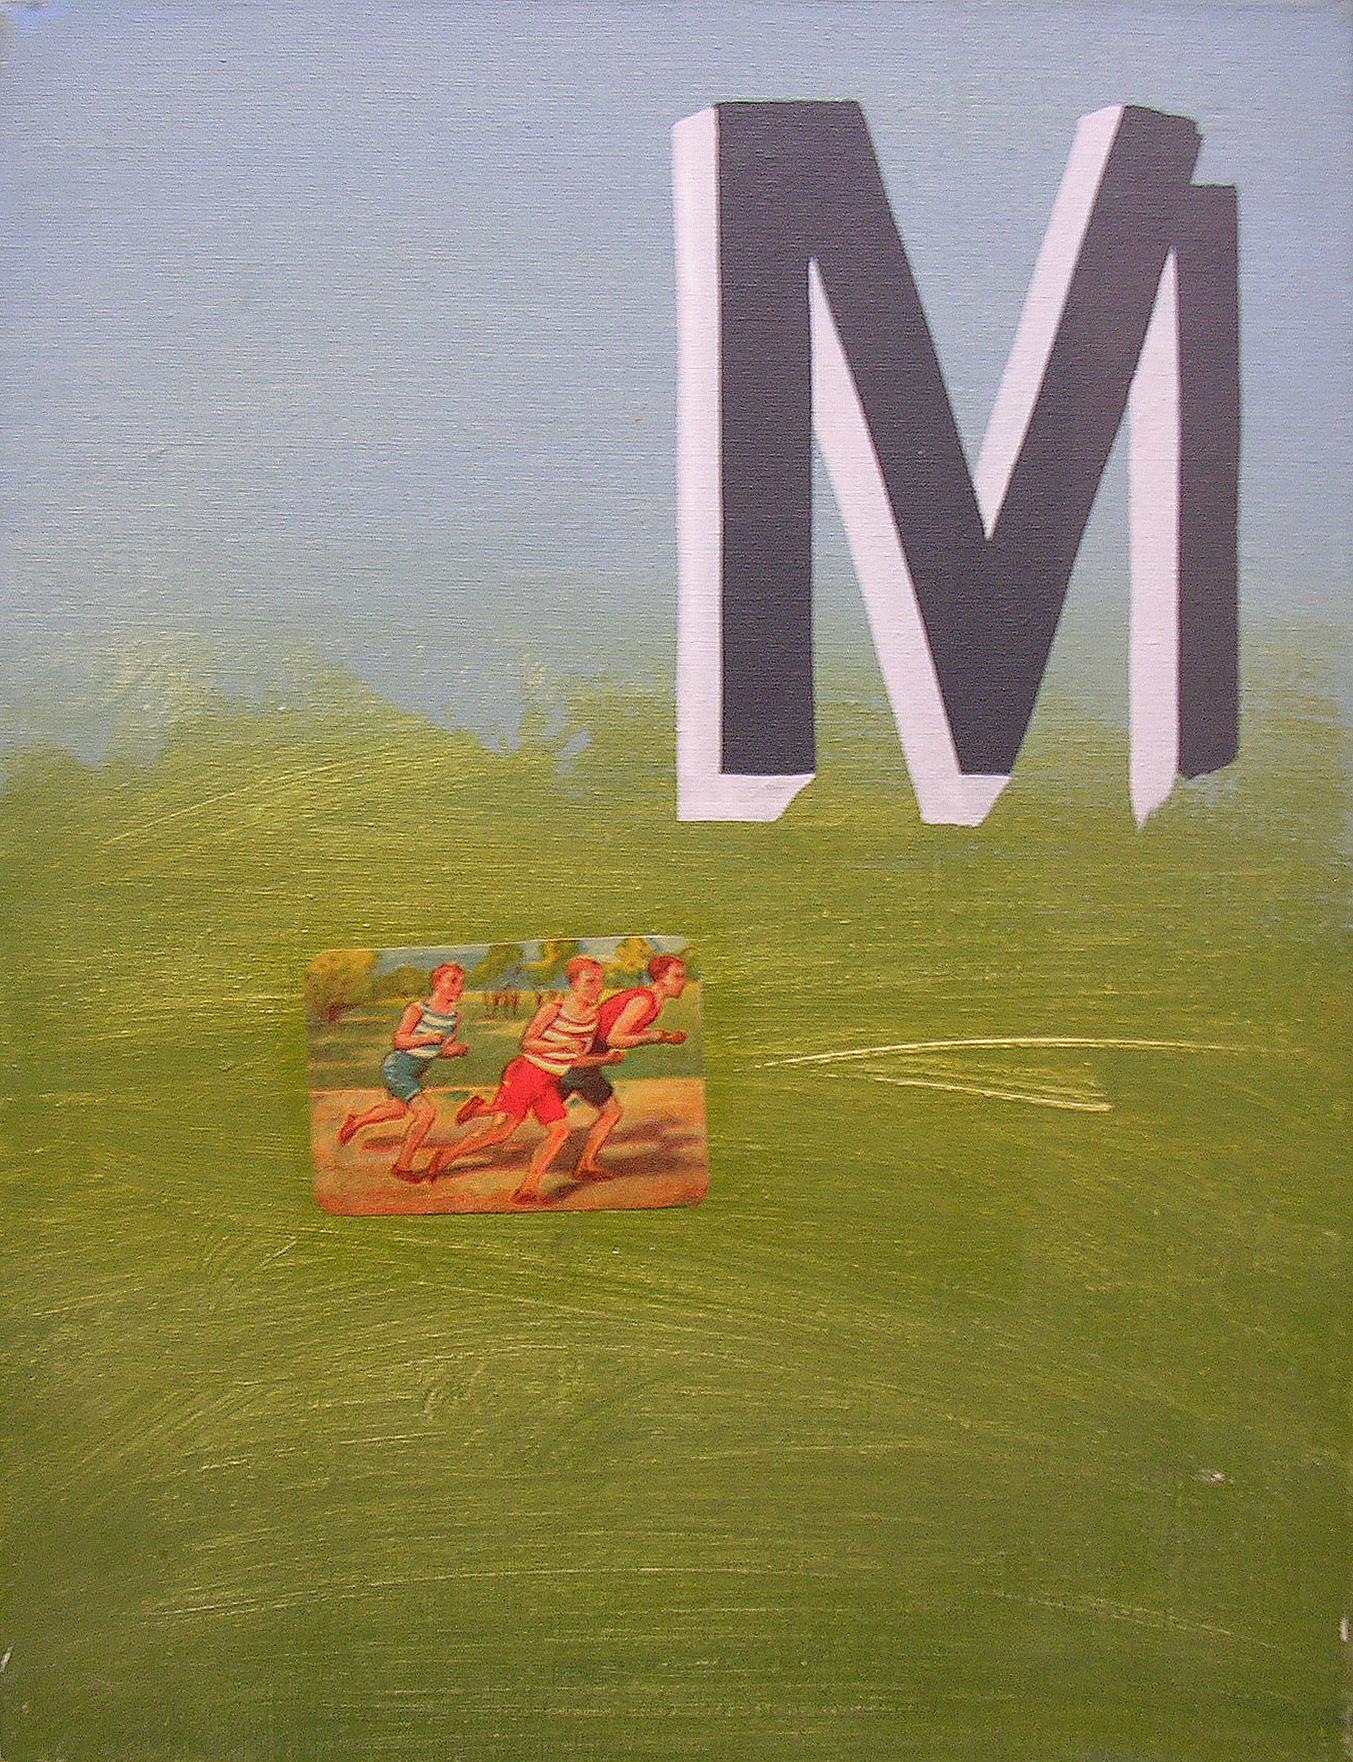 Abecedario M Maratón ; objetos ensamblados, tela, papel sobre bastidor, 30 cm x 40 cm, 2007